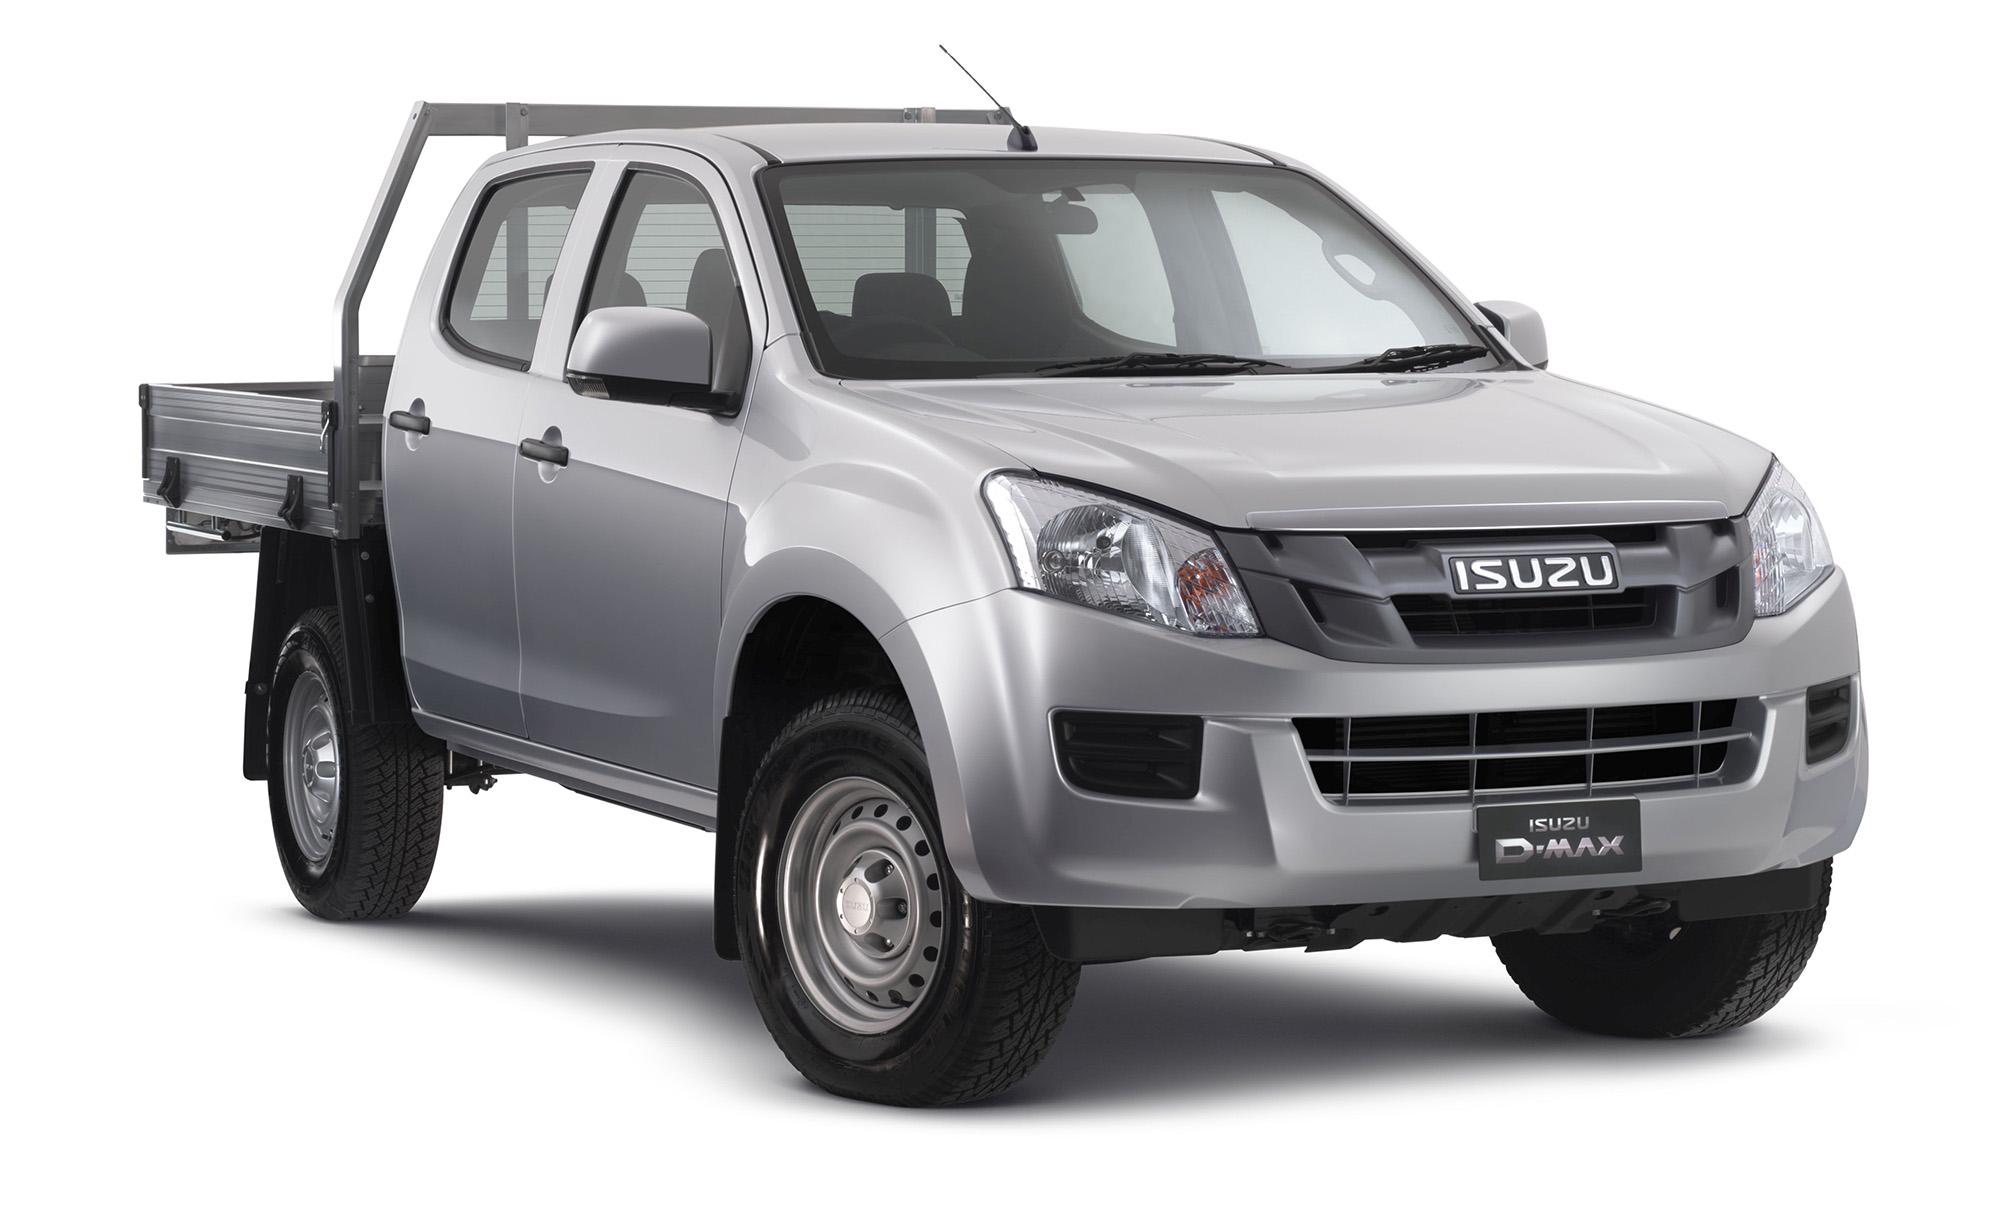 Isuzu Ute Australia Adds New D Max Mu X 4x2 Models Ute